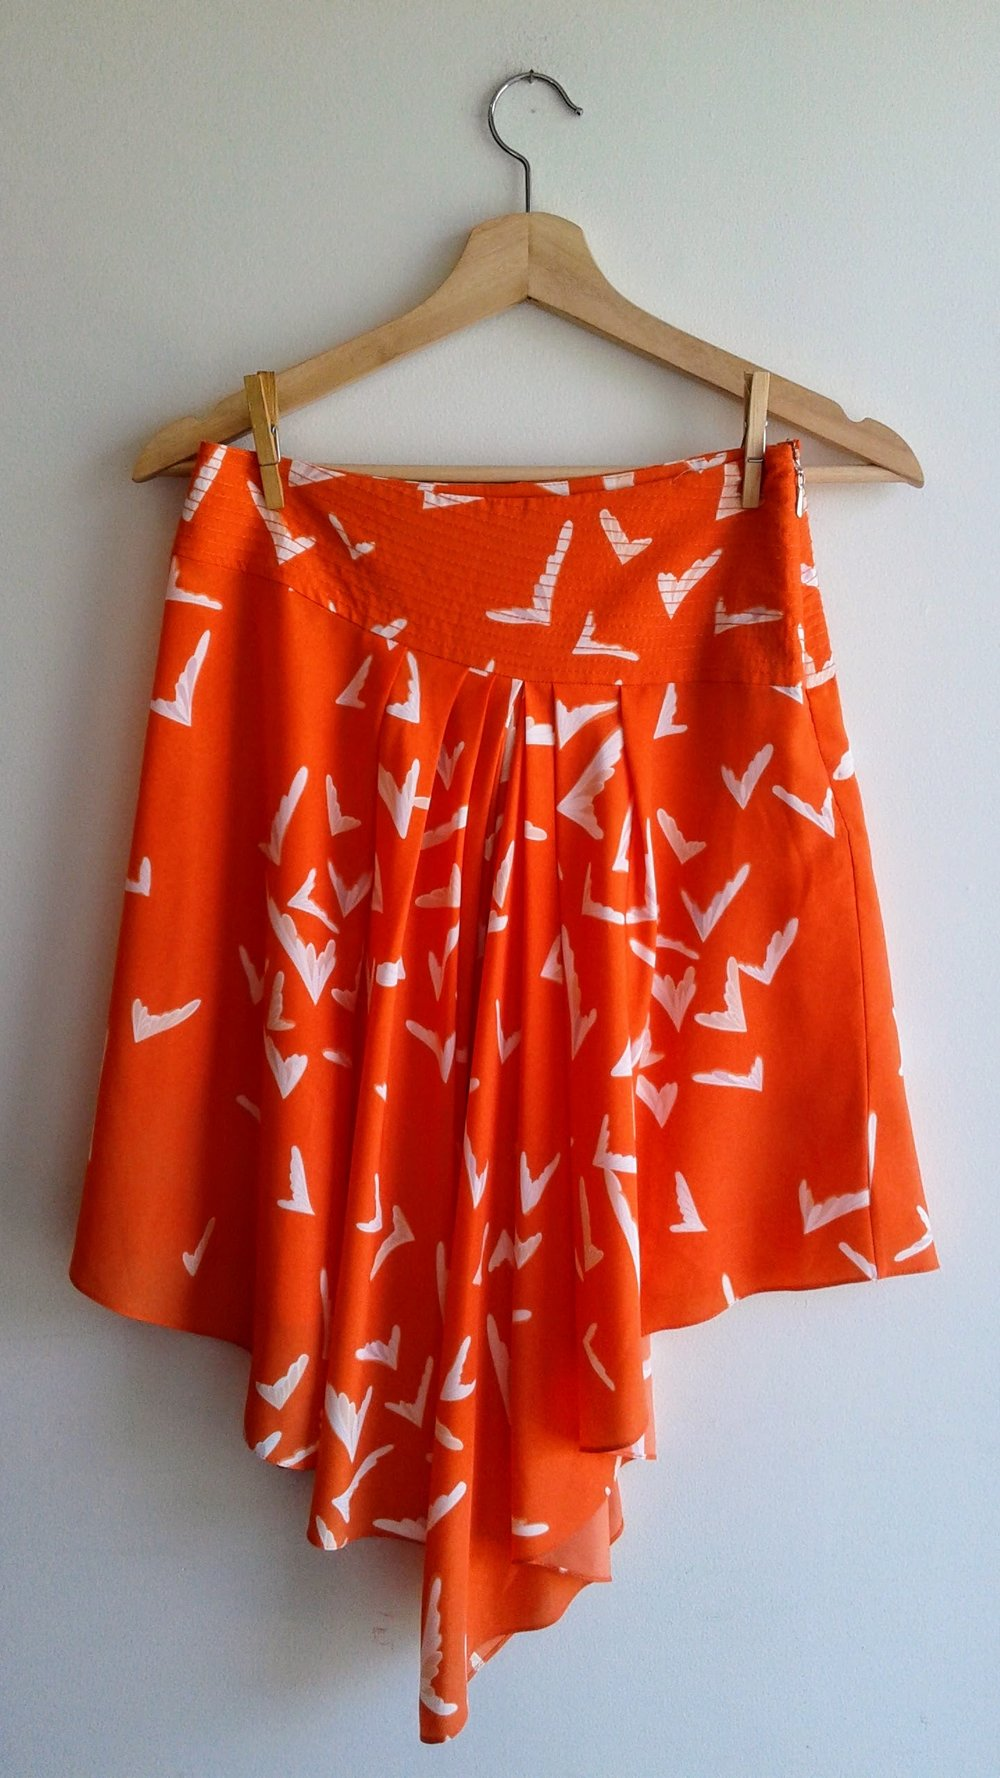 Leifsdottir skirt; Size 2, $36